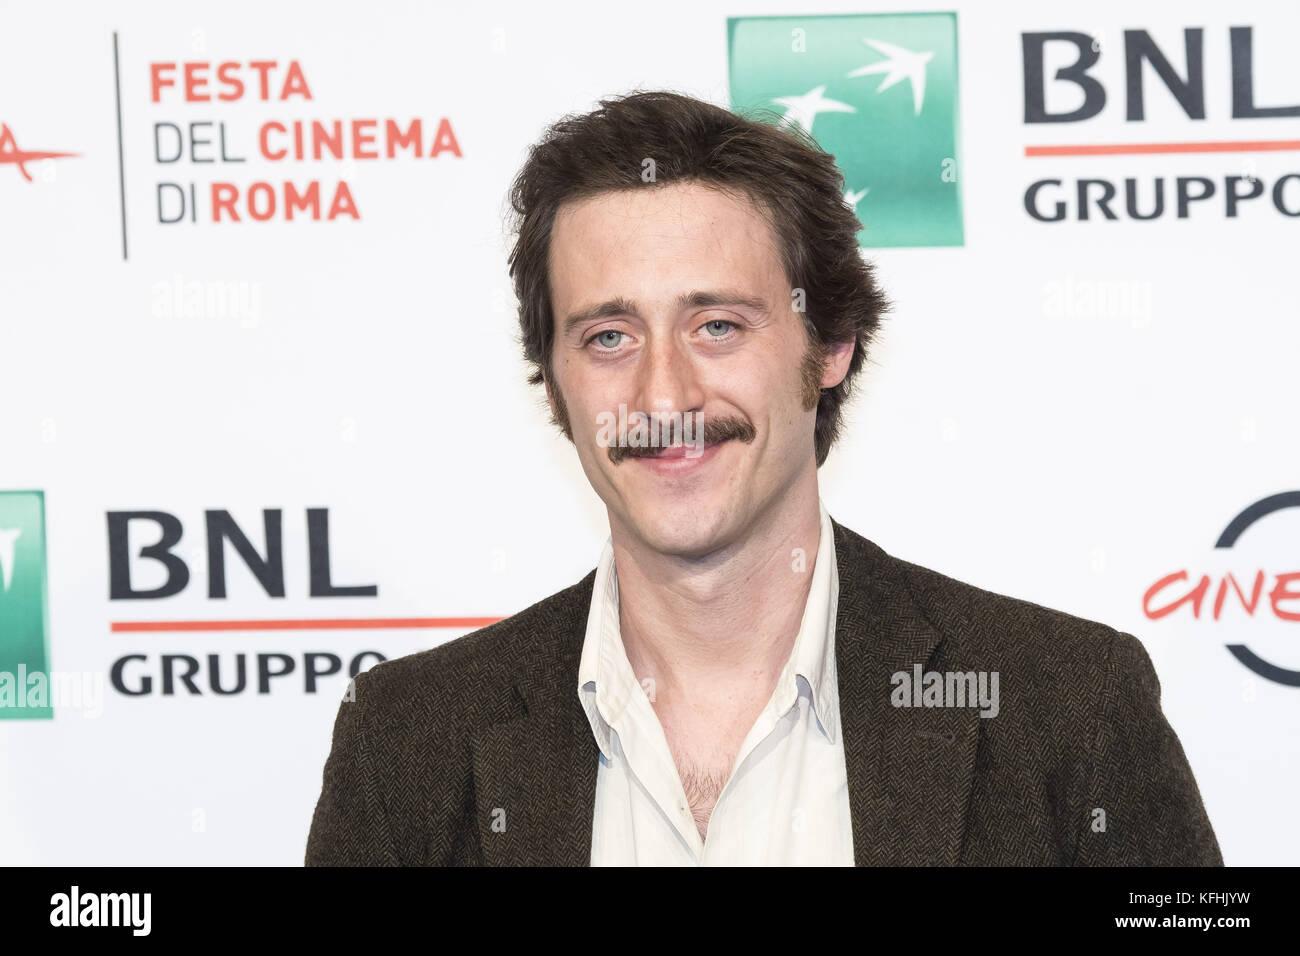 Rome, Italy. 29th Oct, 2017. Photocall of Metti una notte at Rome FIlm Festival 2017 Credit: Silvia Gerbino/Alamy - Stock Image